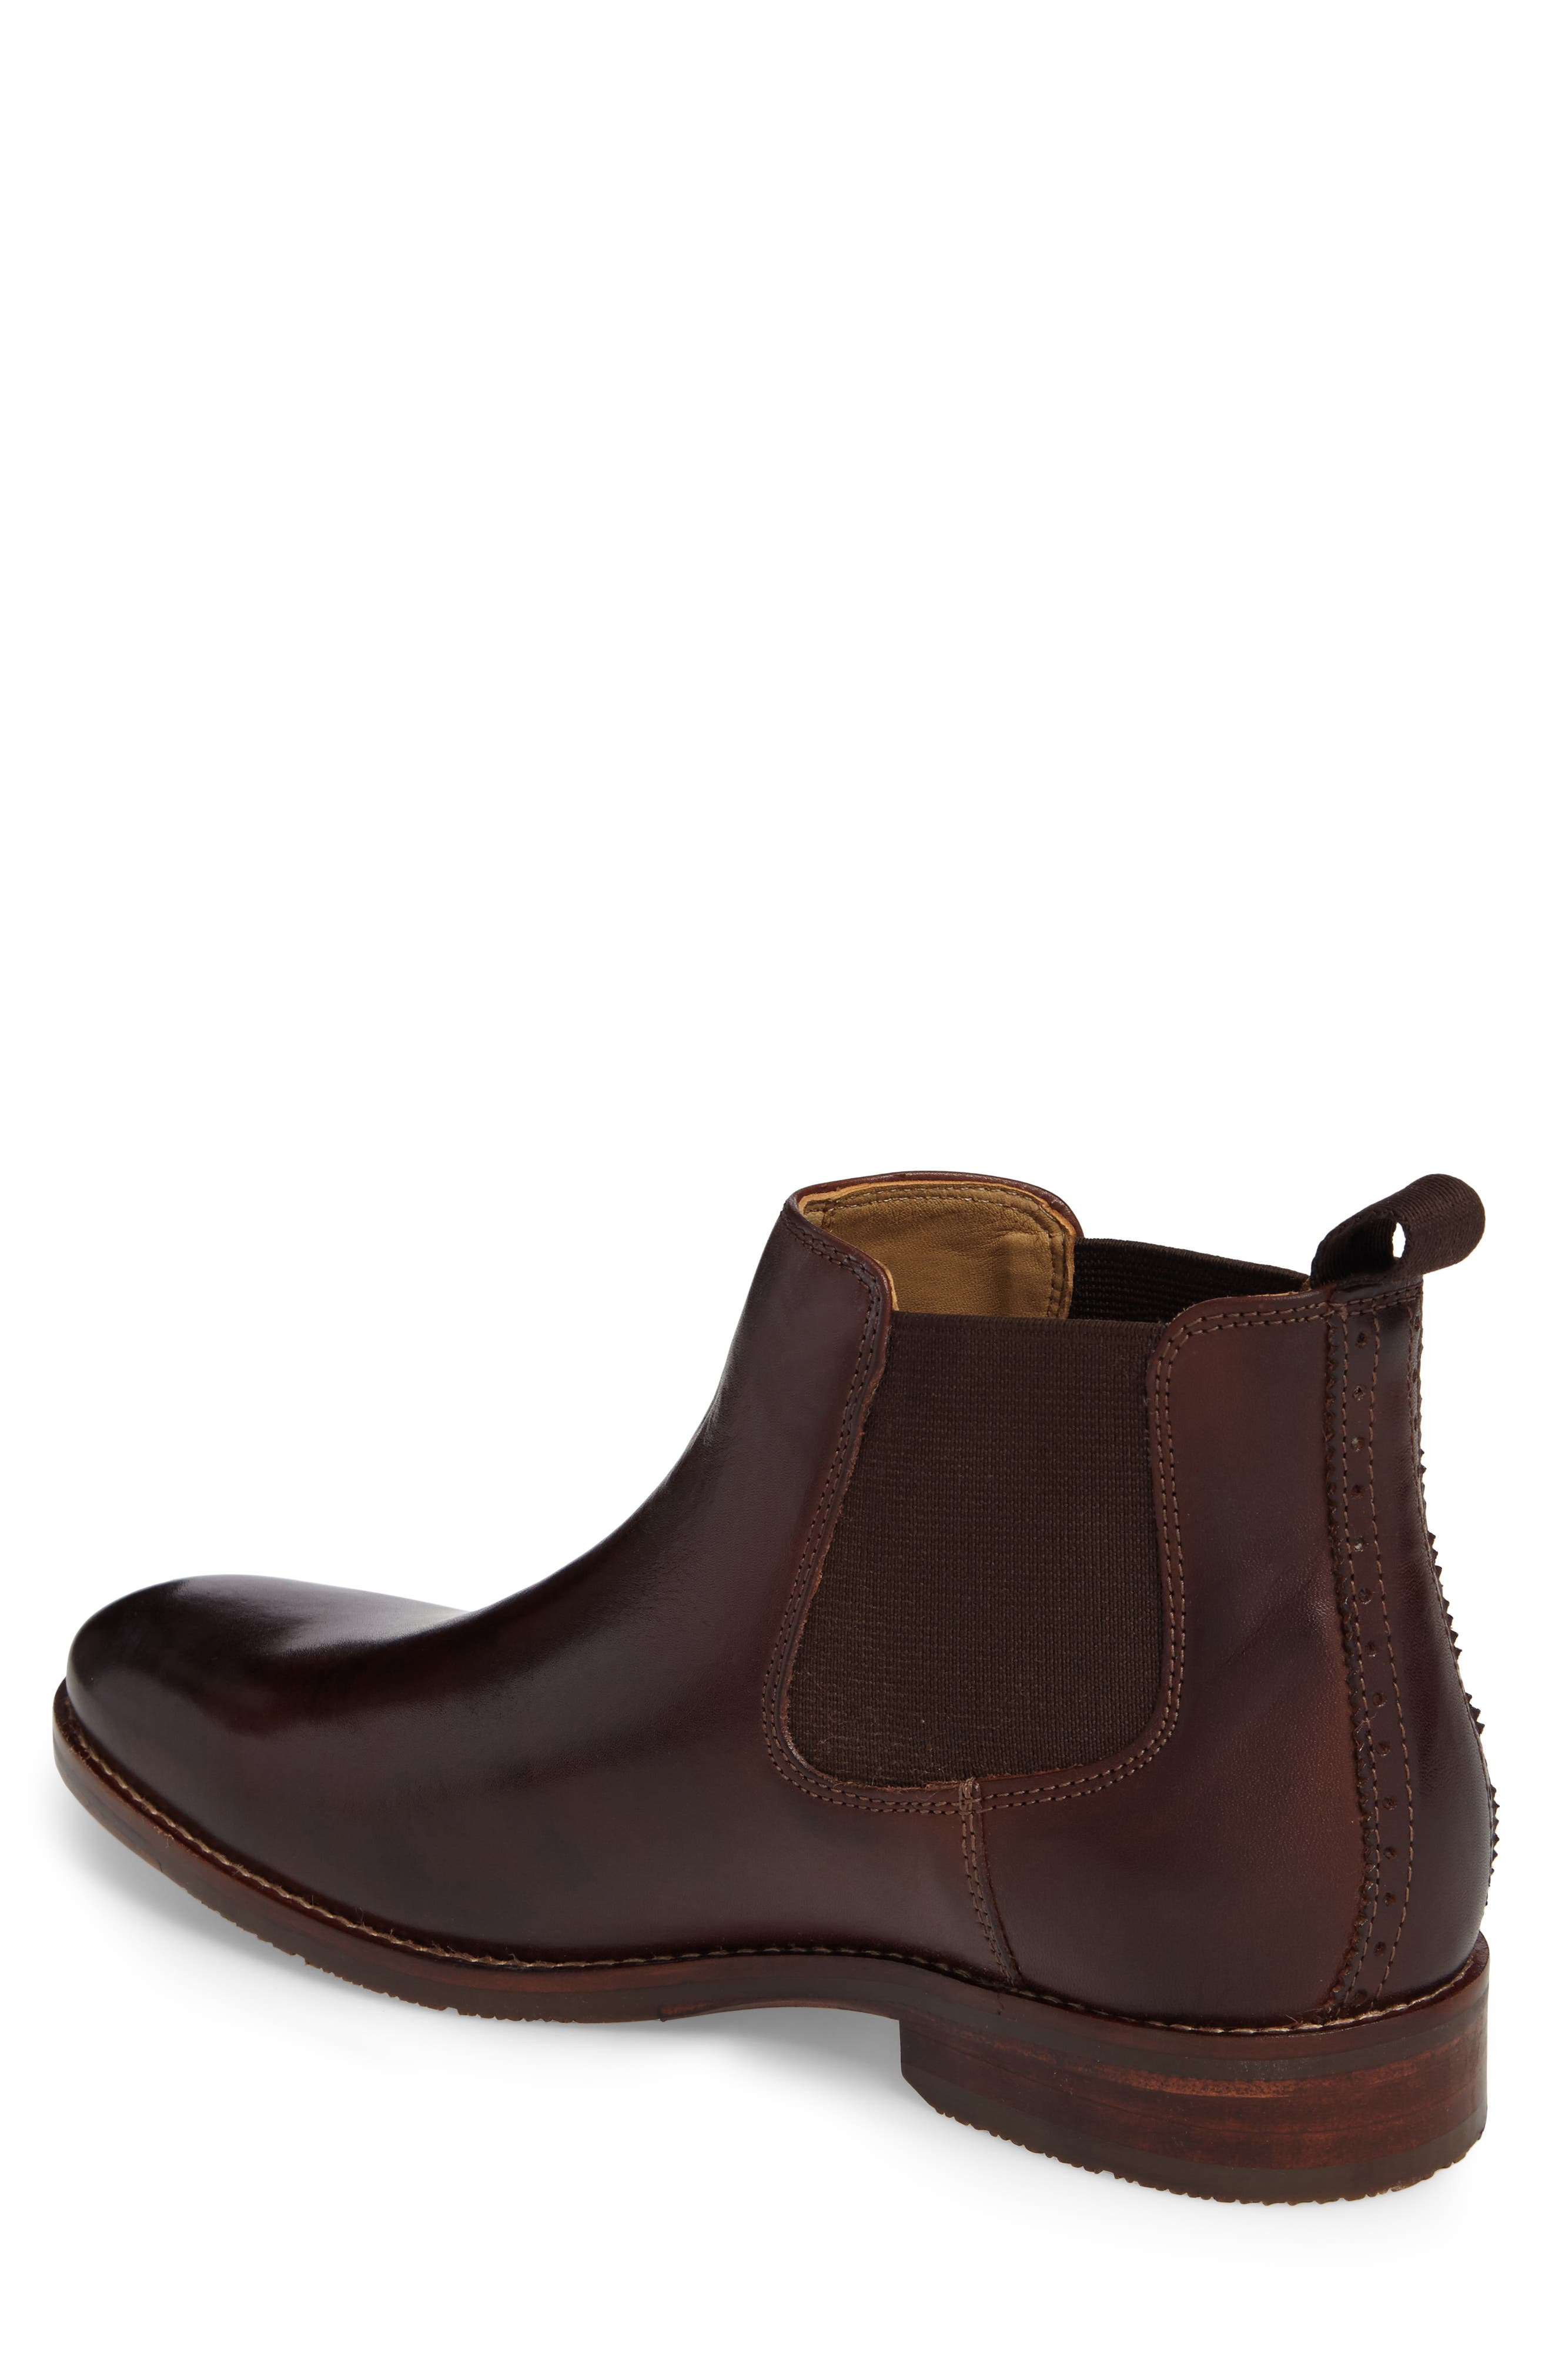 Garner Chelsea Boot,                             Alternate thumbnail 2, color,                             Mahogany Leather